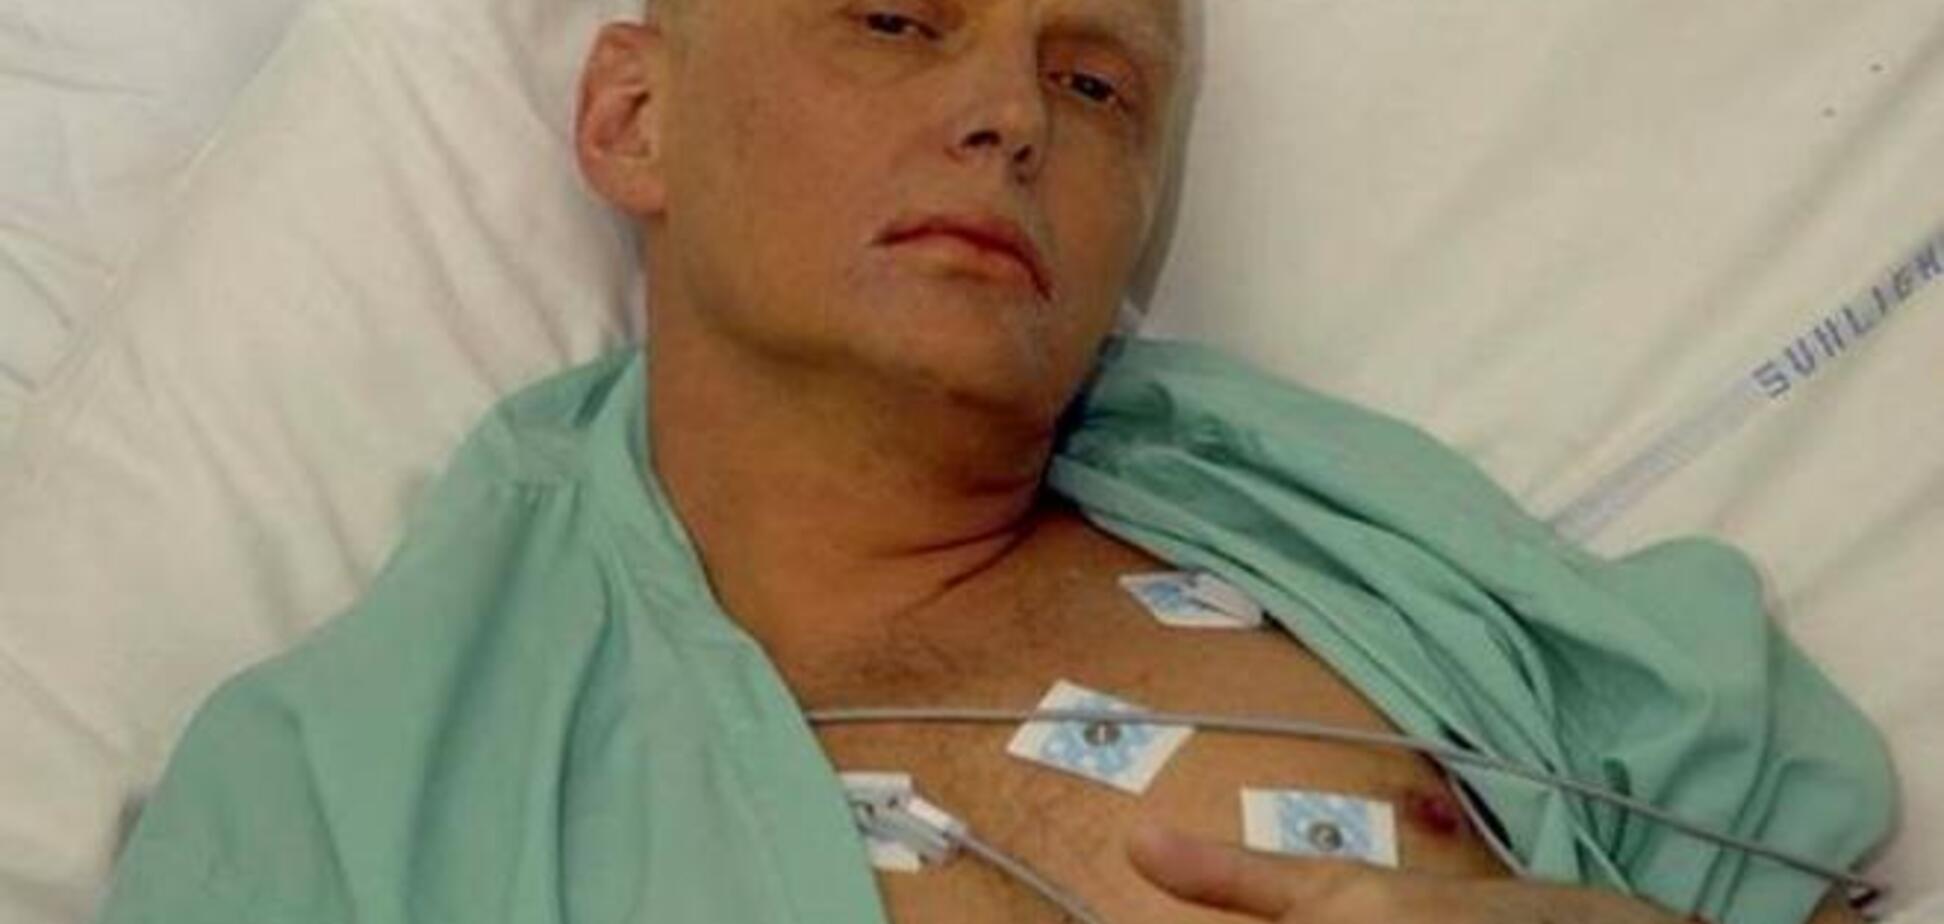 Западные СМИ: Литвиненко убили из-за компромата на друга Путина